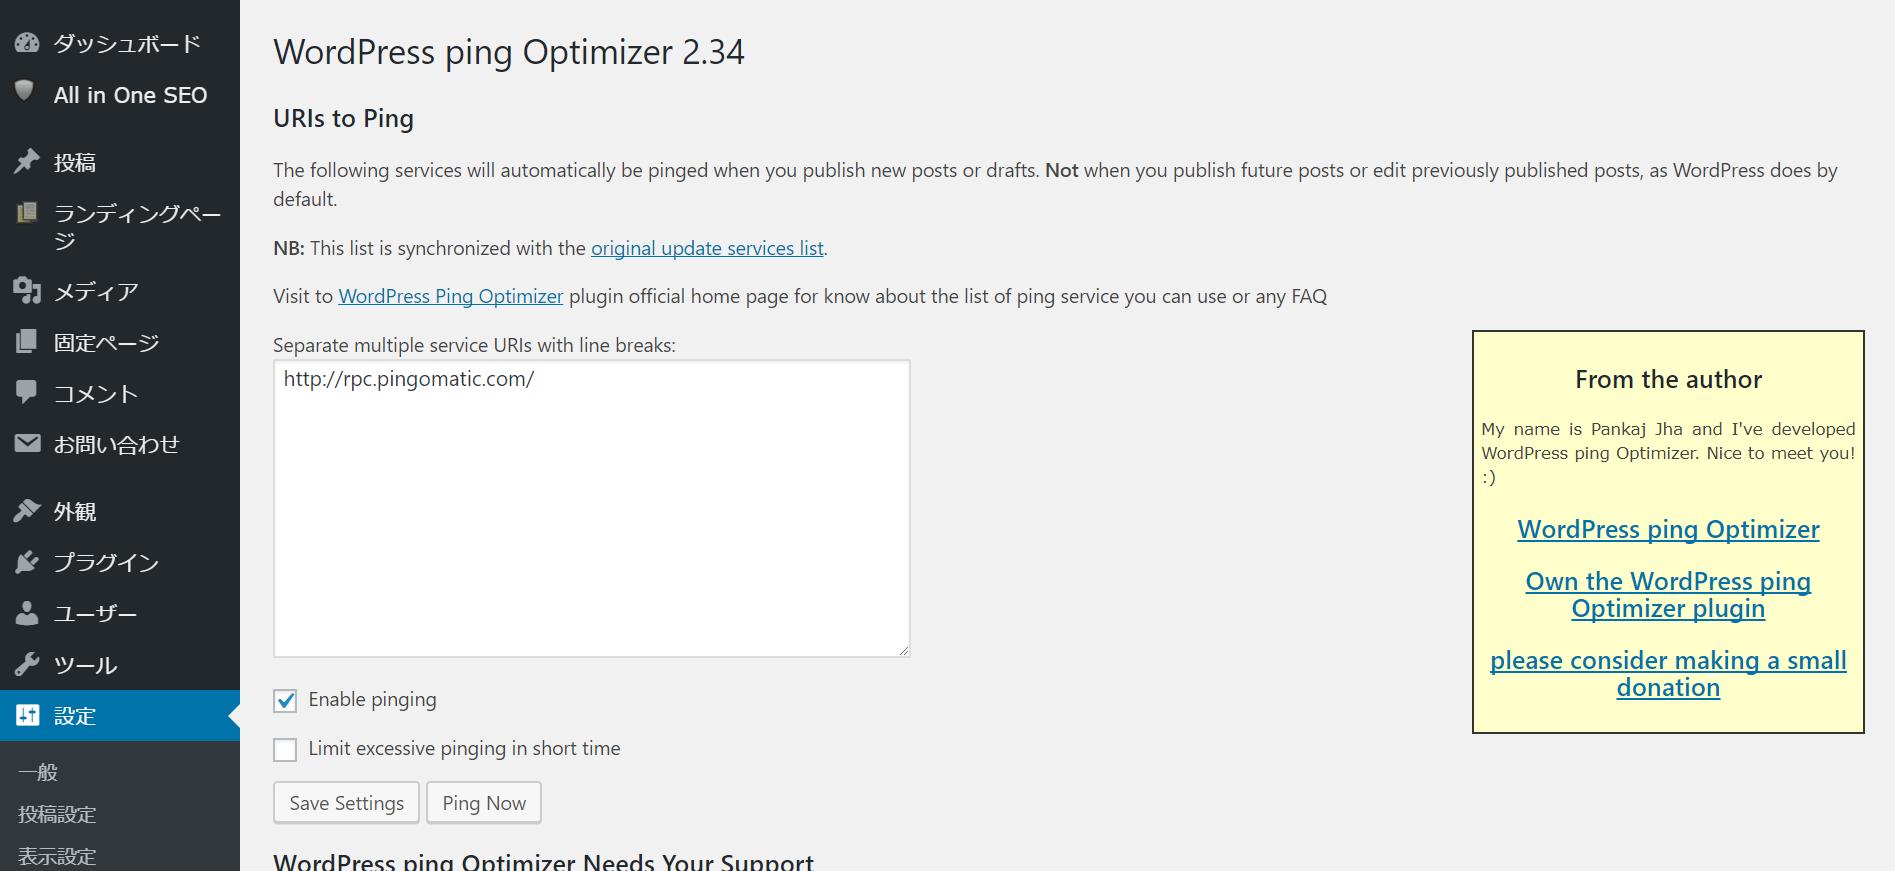 WordPressPingOptimizer初期画面